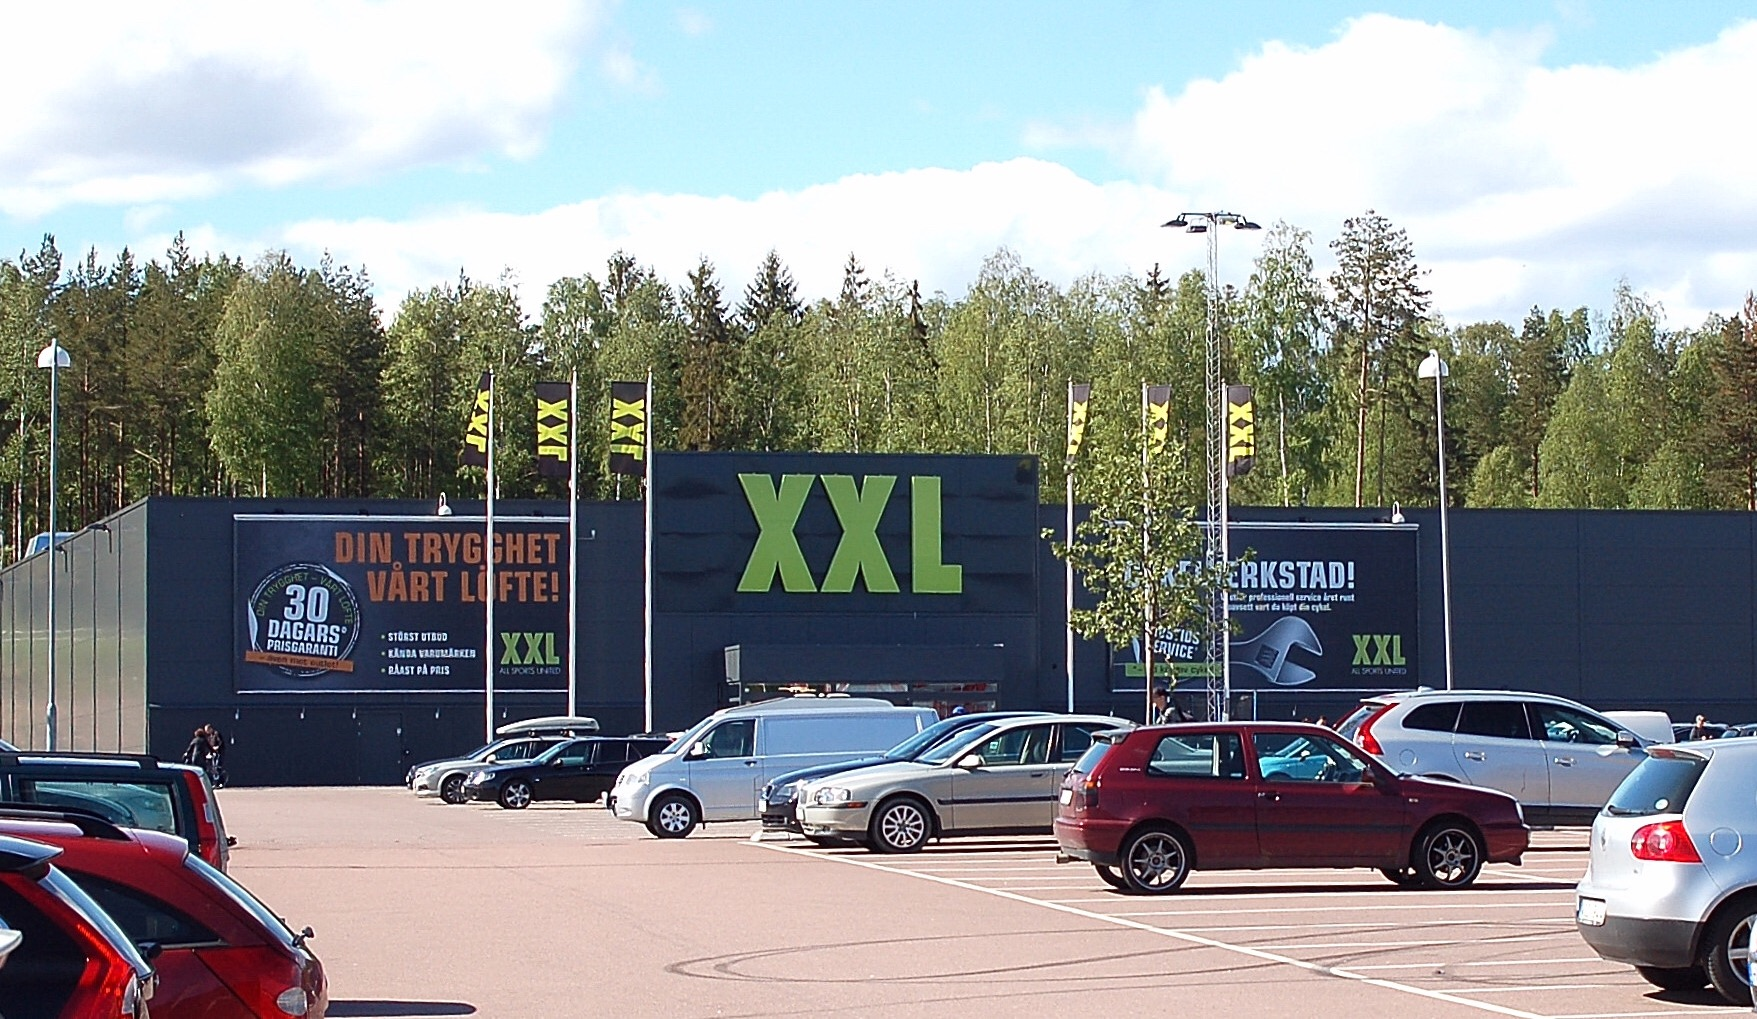 Xxl Uppsala